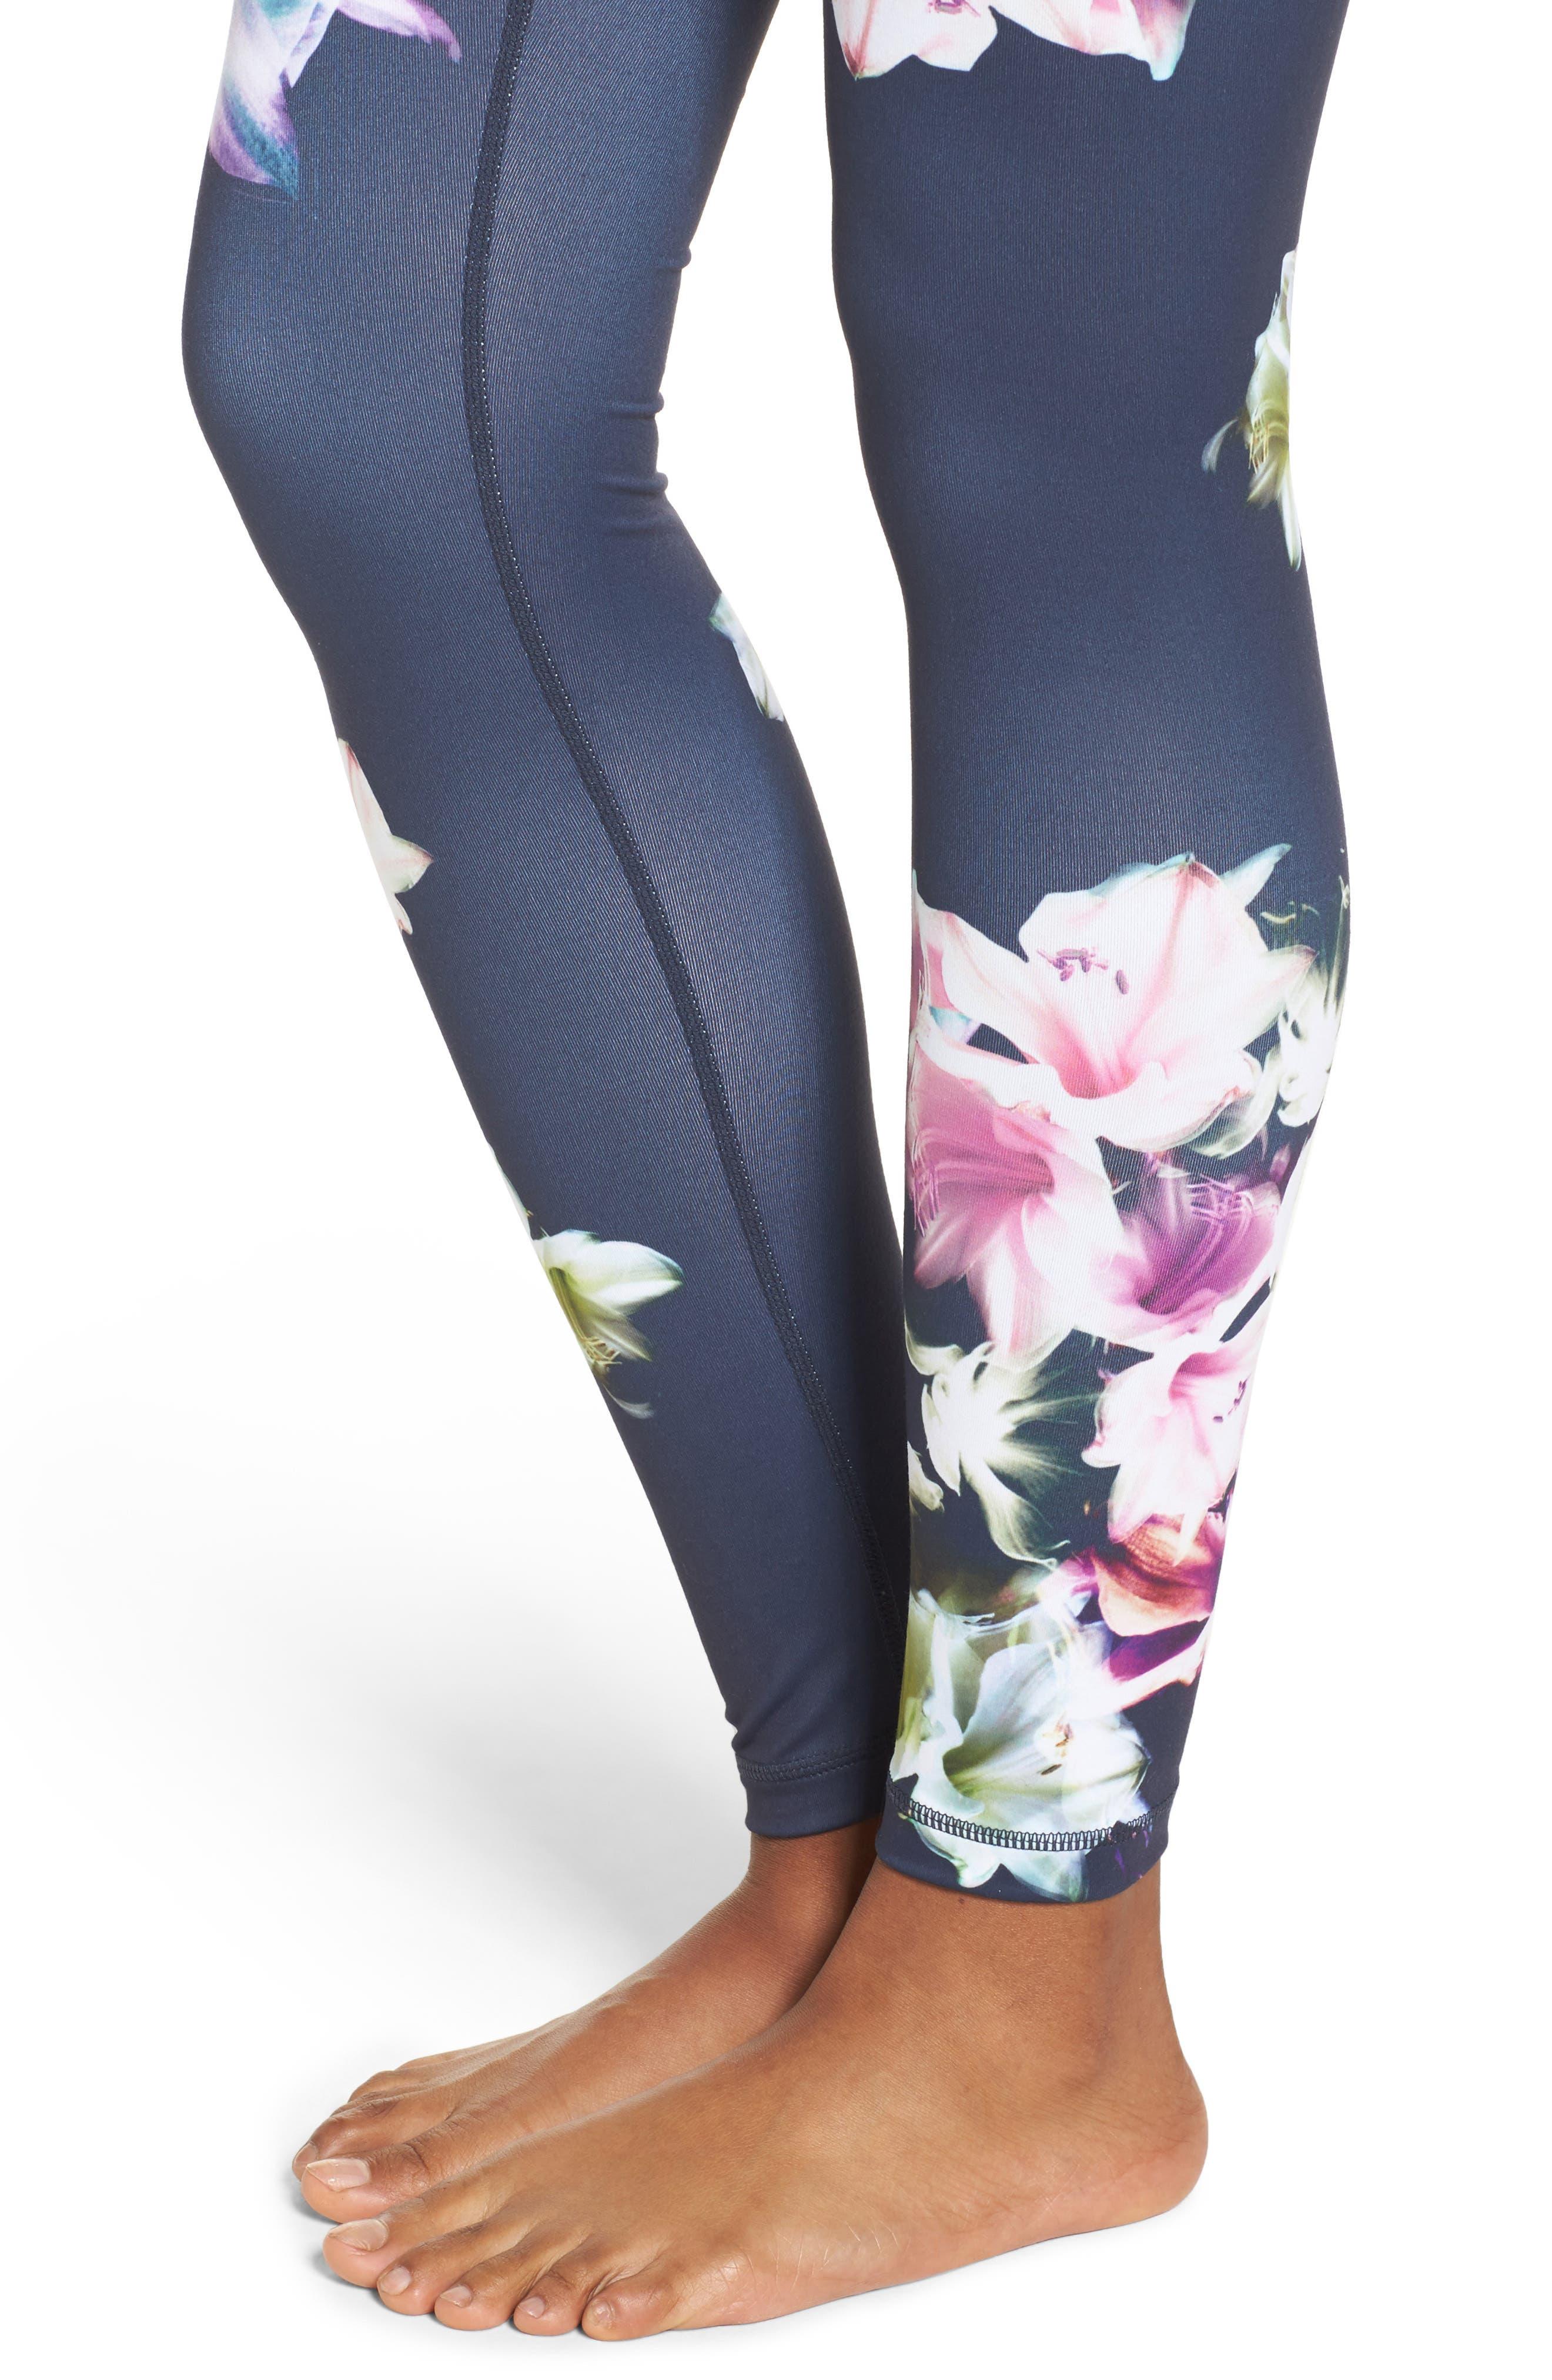 Pure Floral Ink High Waist Leggings,                             Alternate thumbnail 4, color,                             Grey Slate Floral Engineer Prt